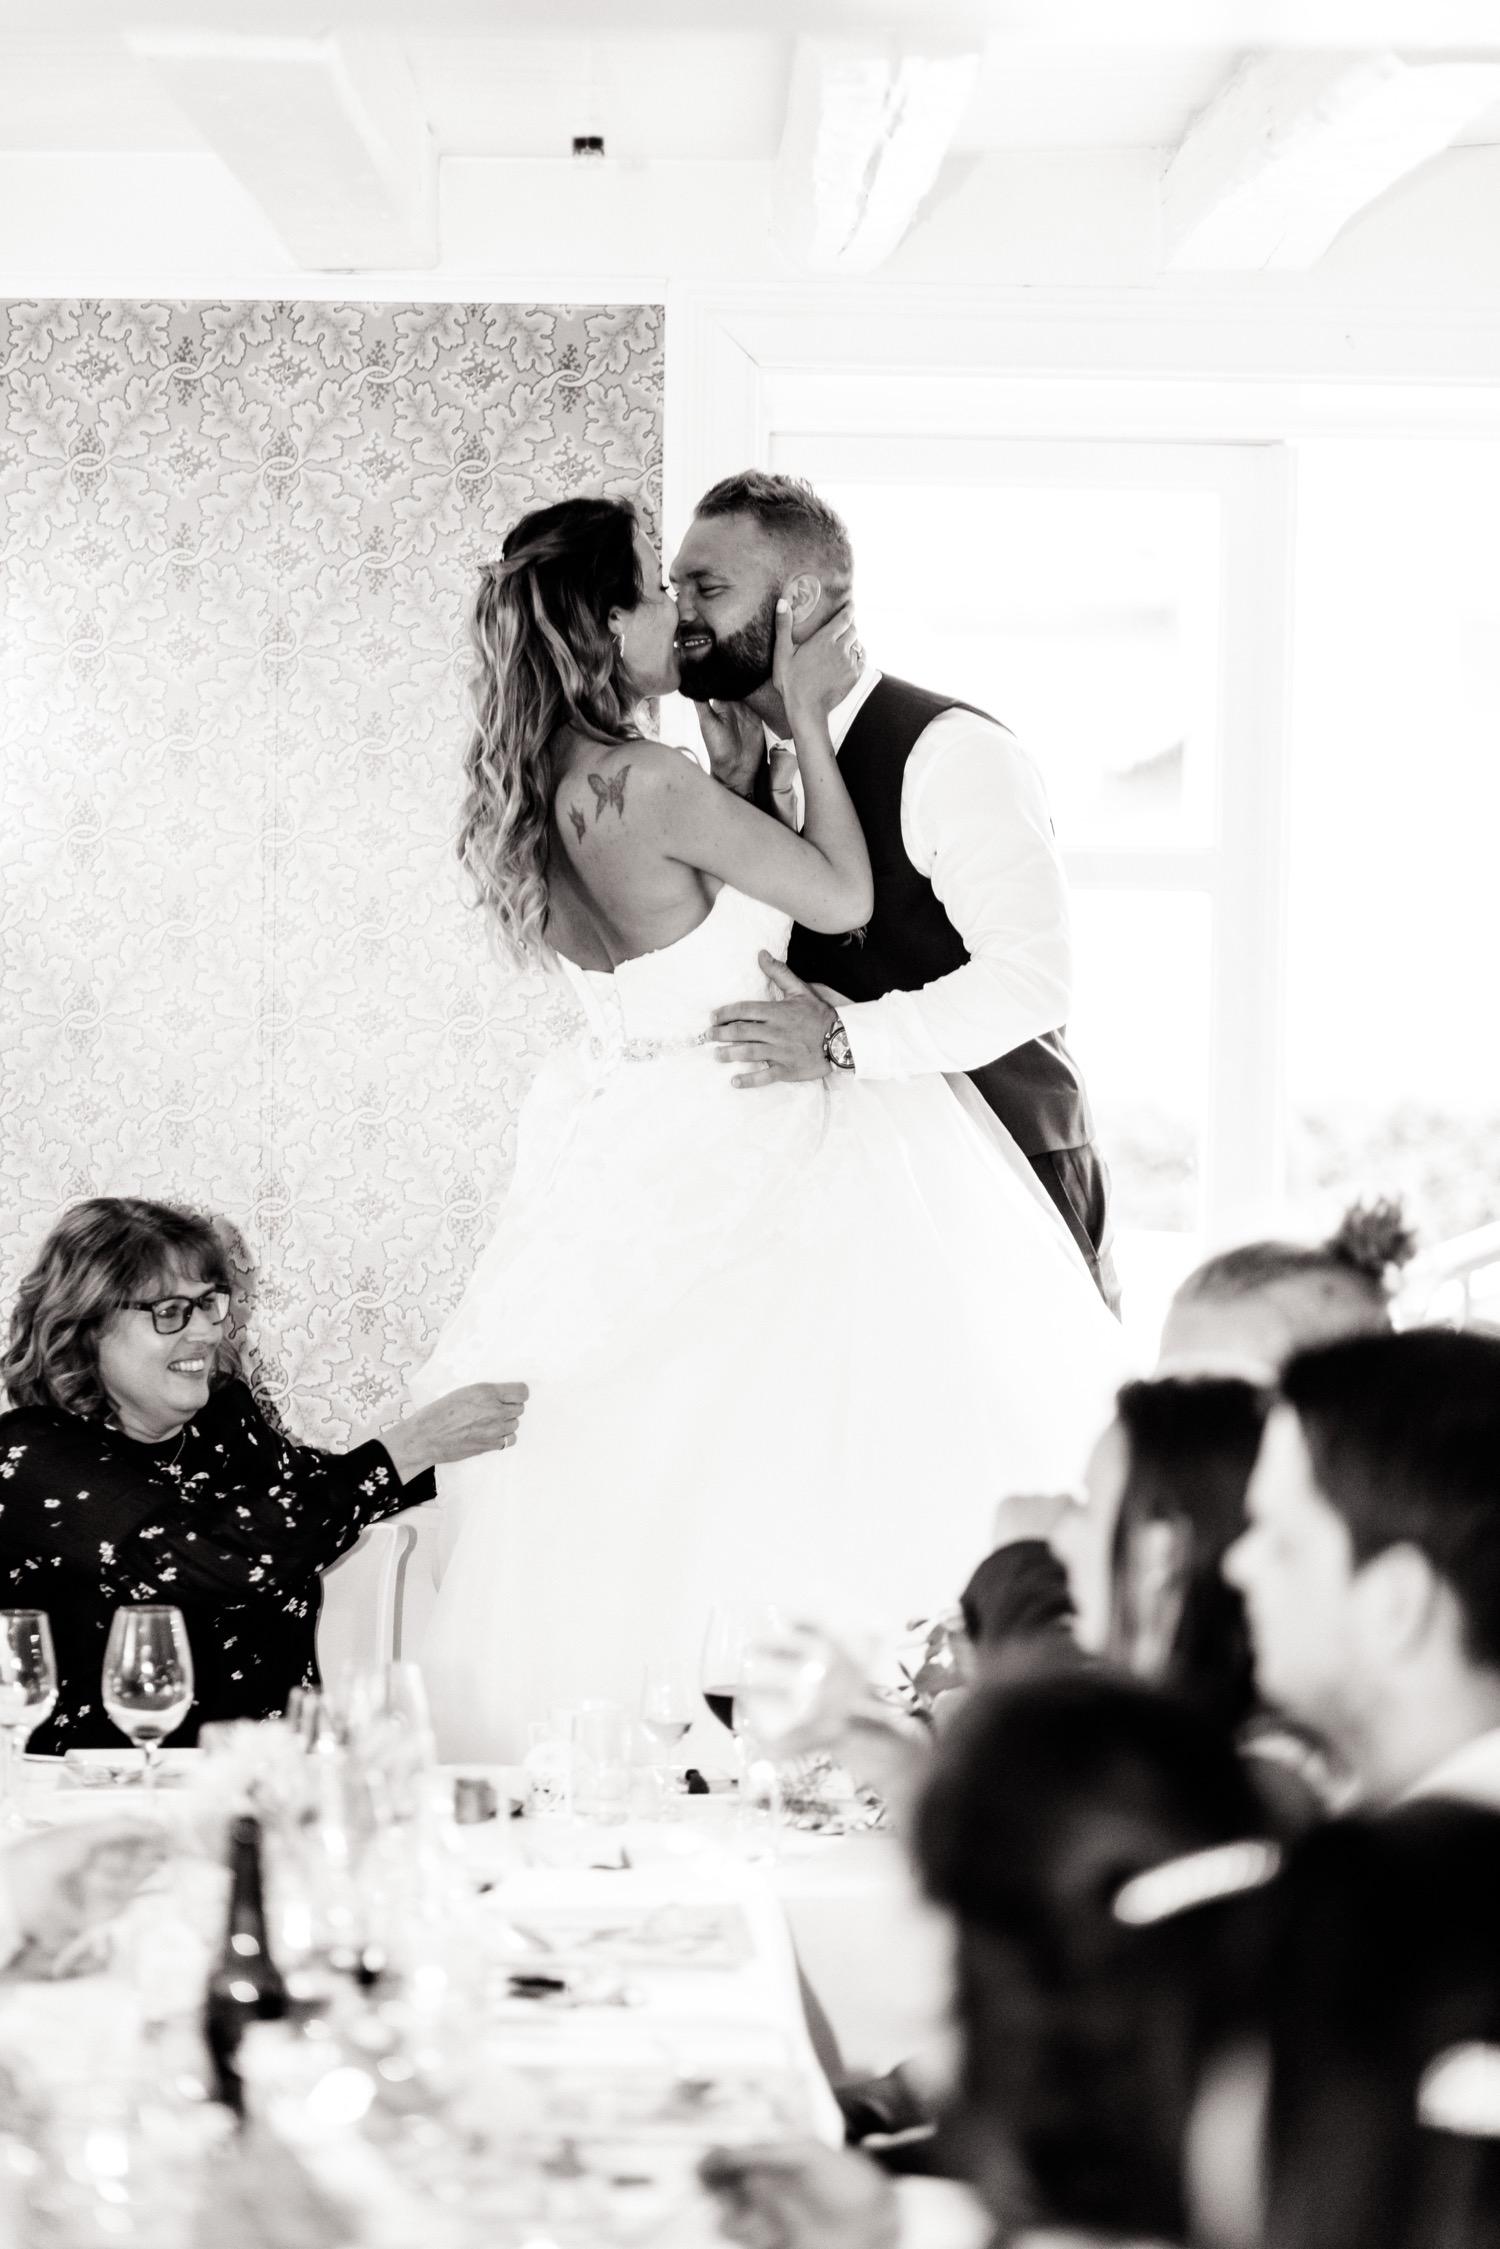 091_weddingphotographer_Bryllupsfotografering_Bryllupsbilder_fatmonkeyfoto_Bryllupsfotograf.jpg